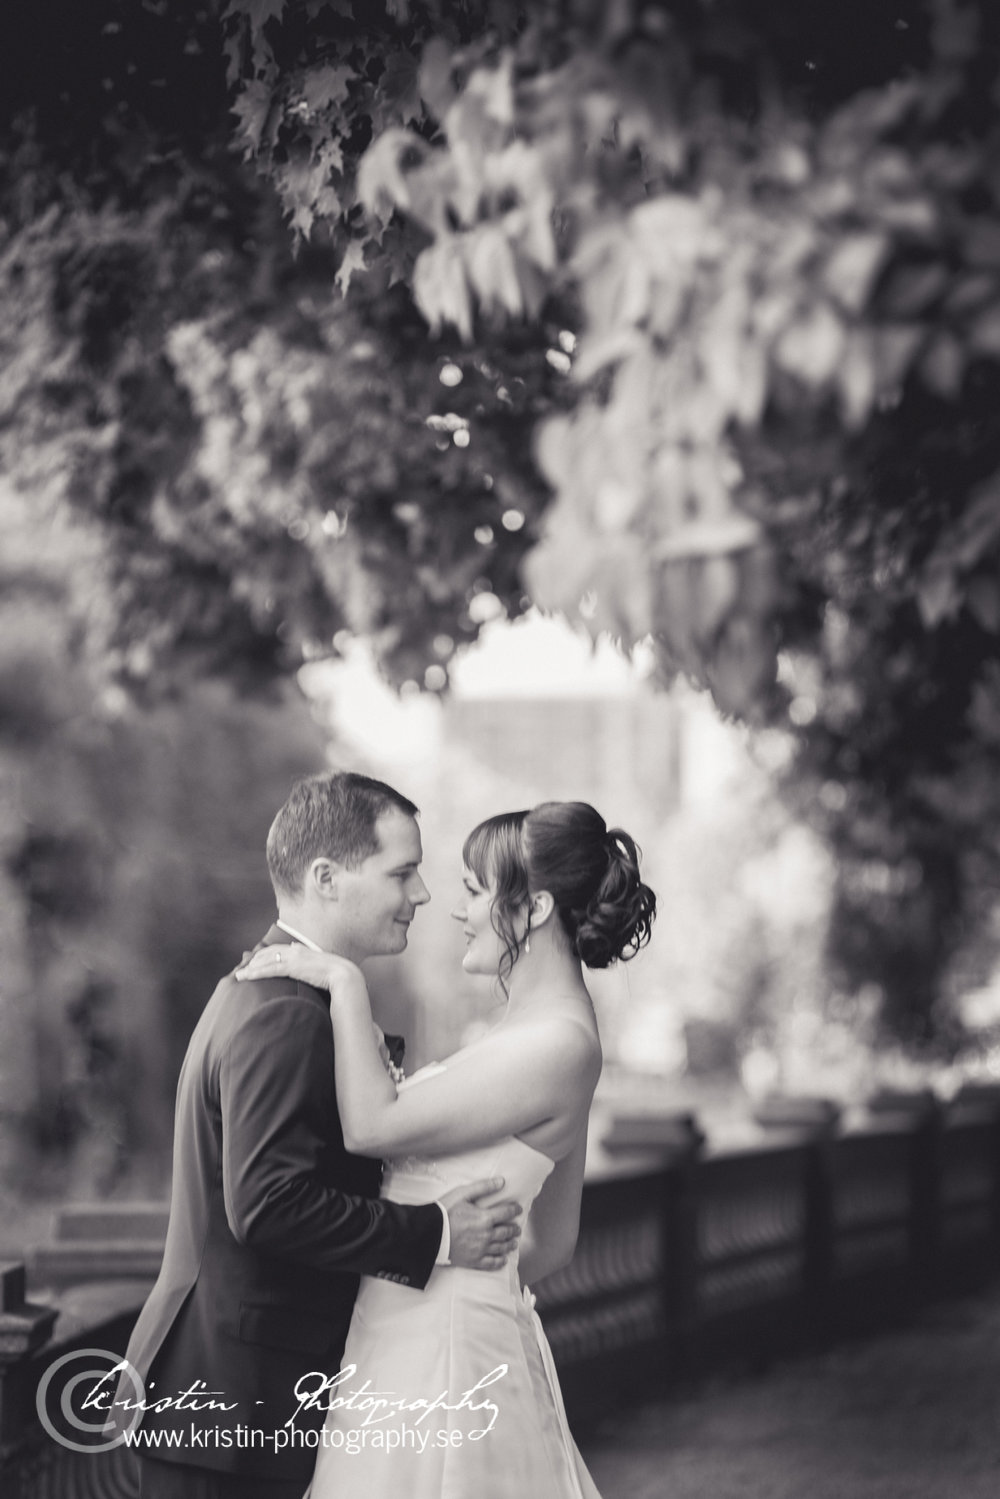 Bröllopsfotograf i Stockholm, Kristin - Photography , Munchen Bryggeriet-66.jpg